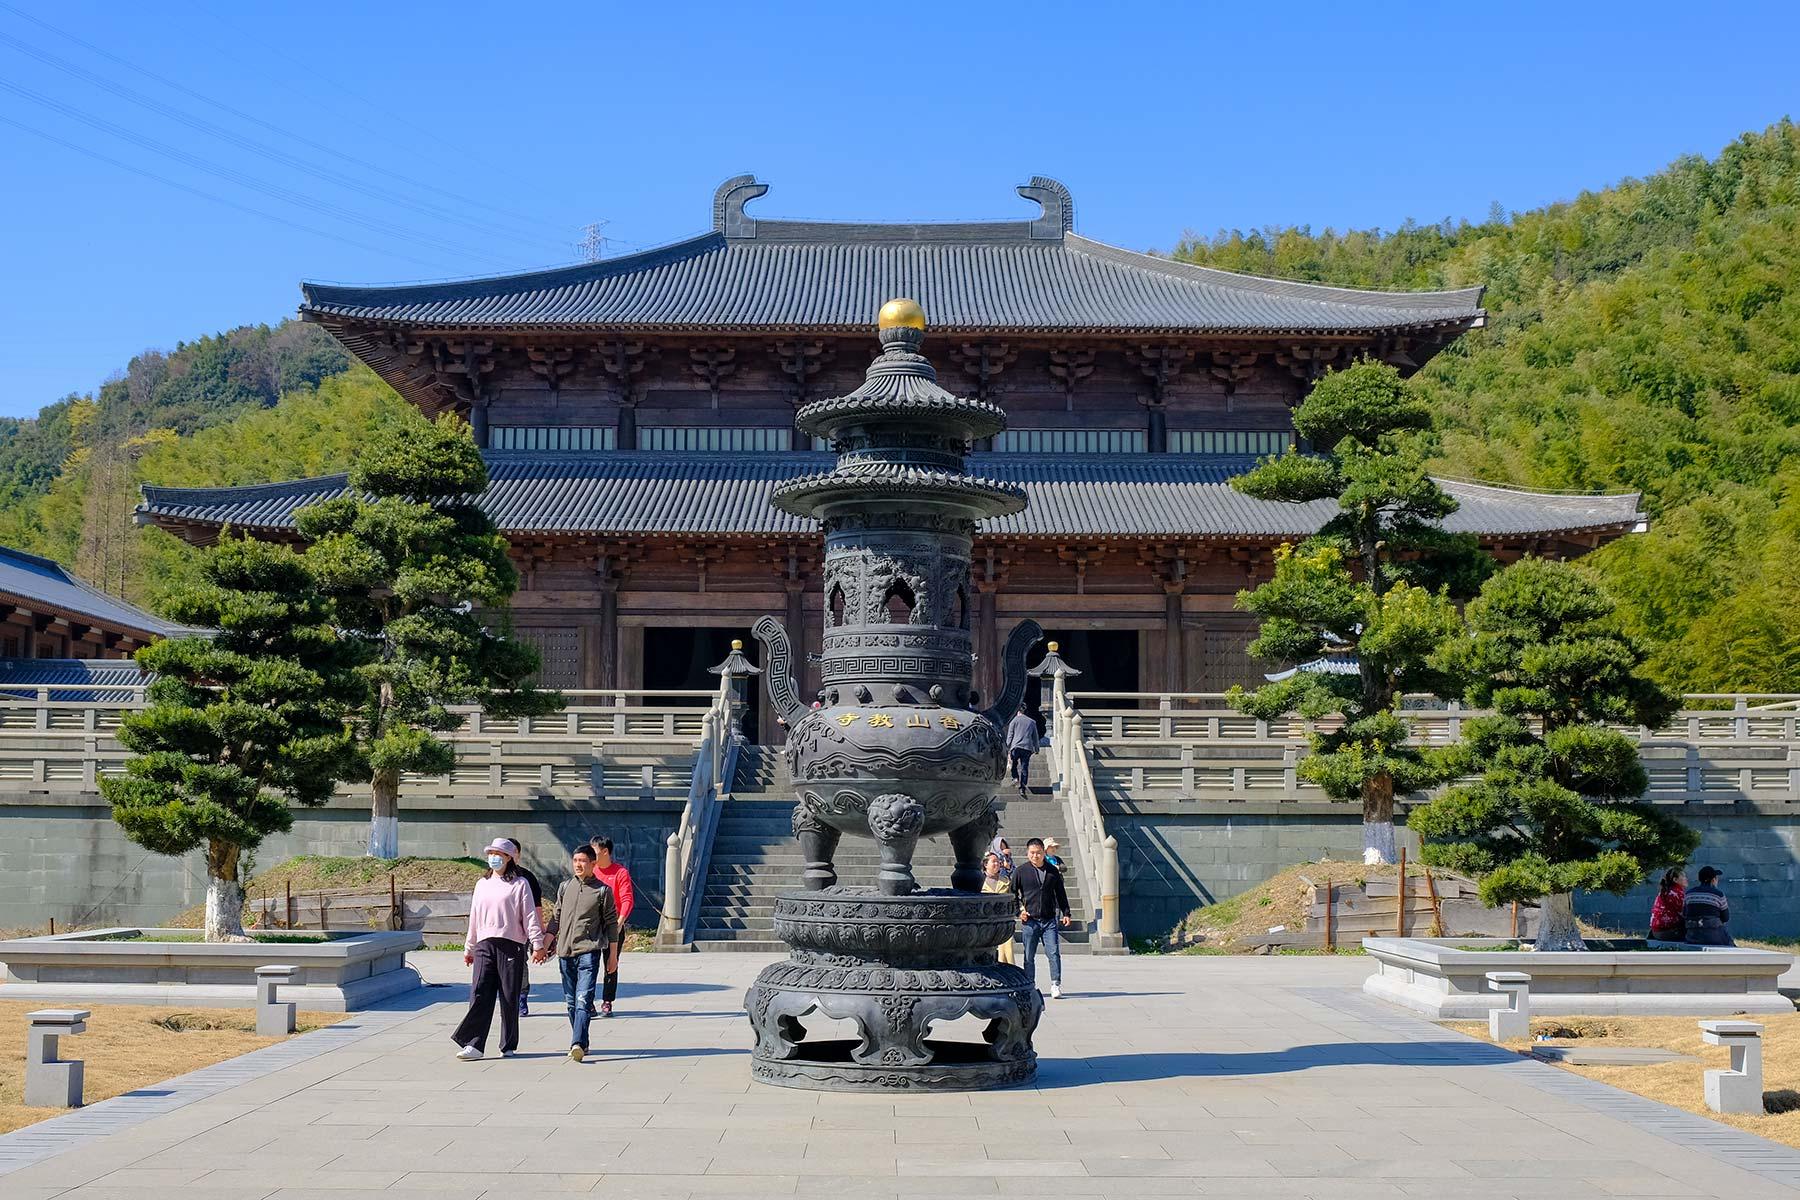 Xiangshan Tempel im Nine Dragon Lake Park in Ningbo, China